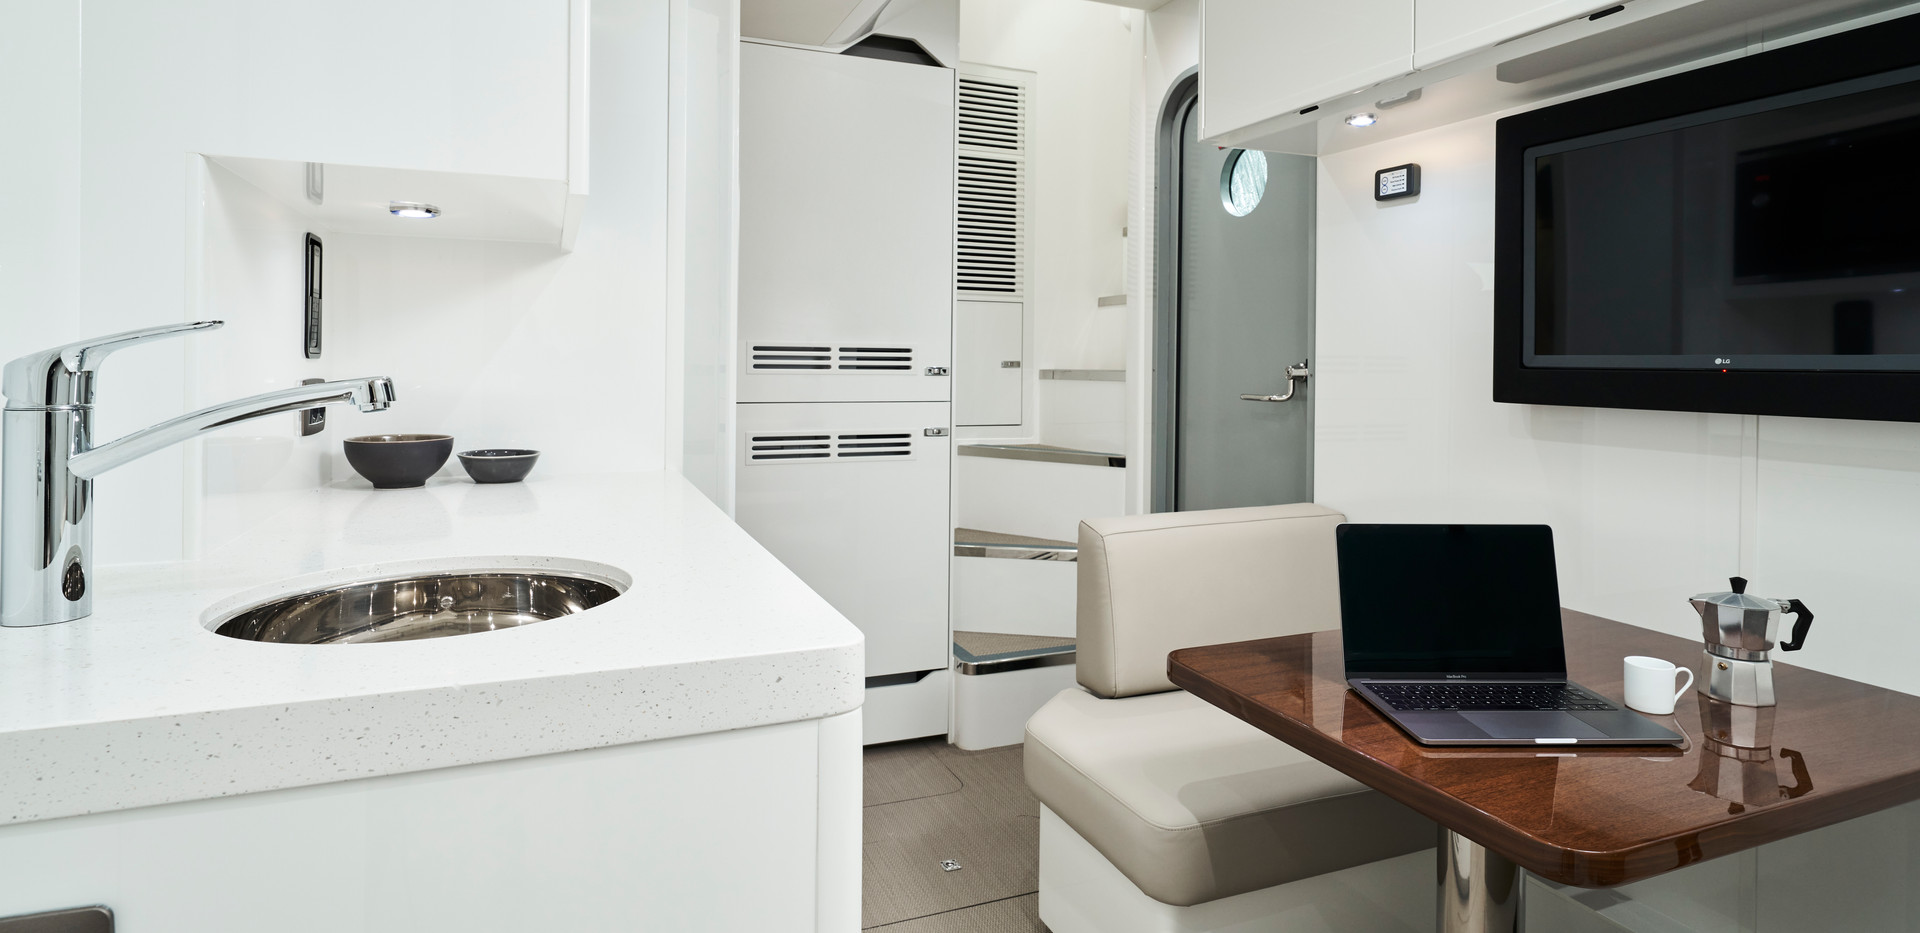 x95-slot-2-interior-crew-galley-1.jpg